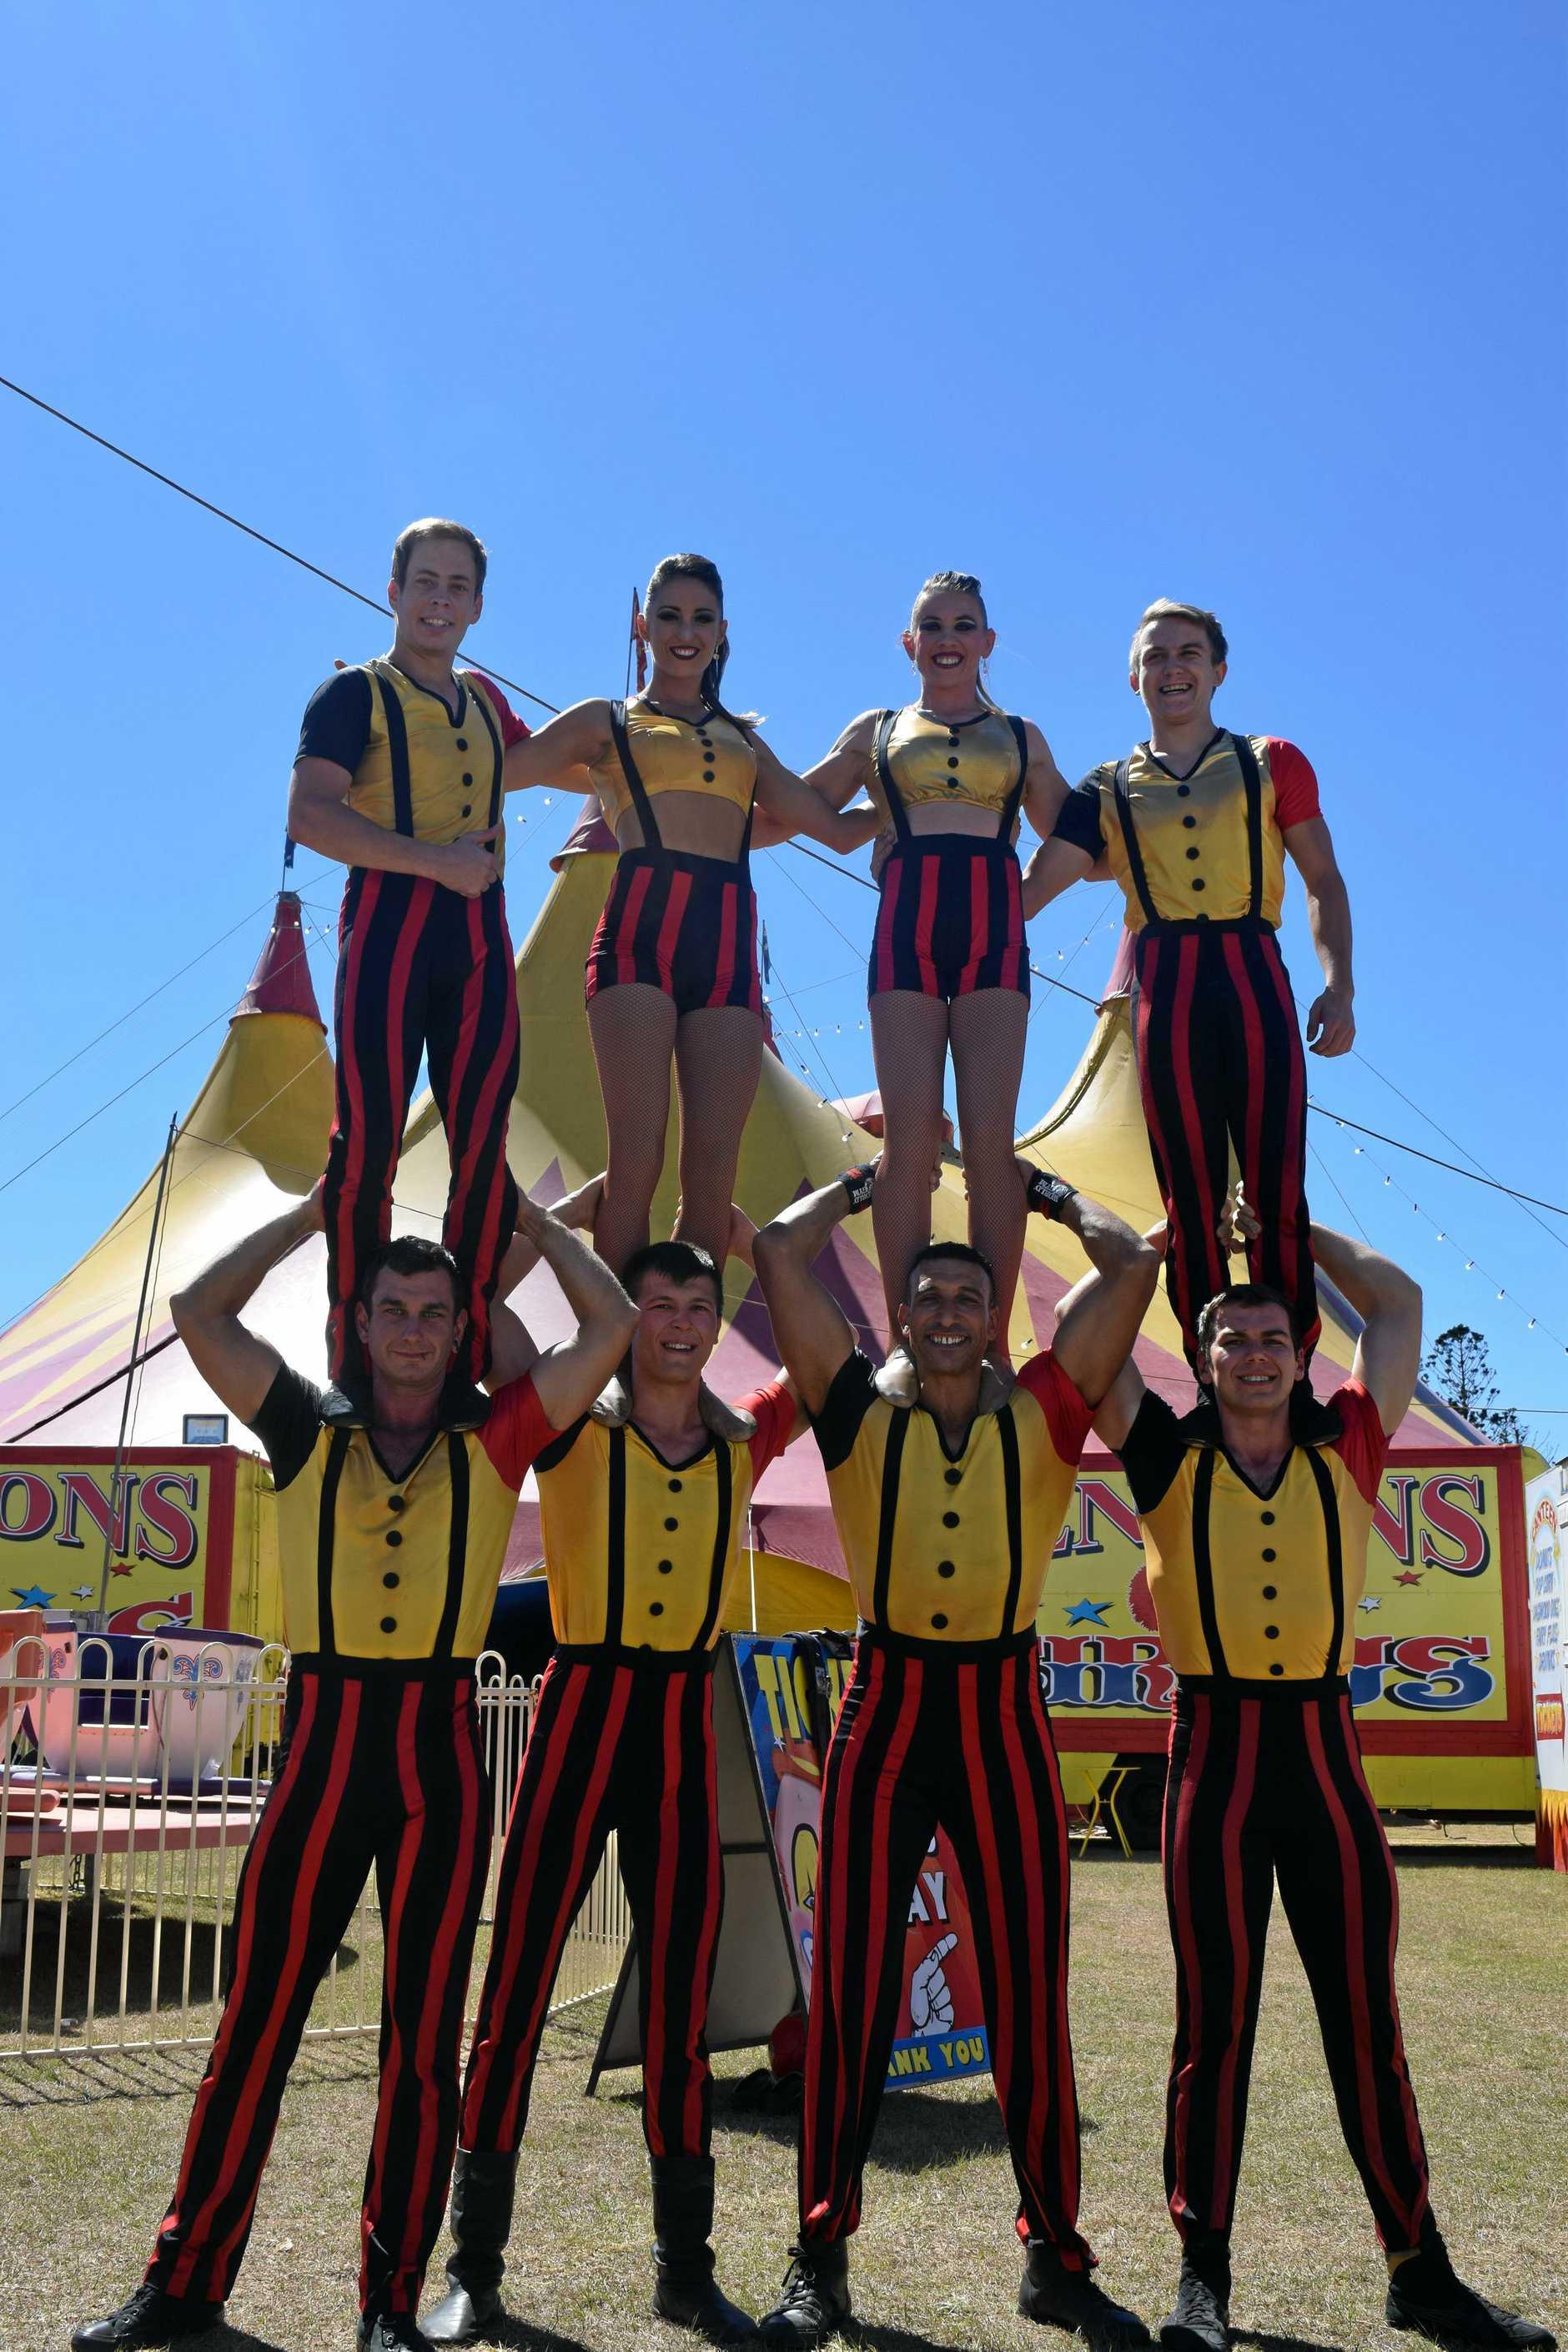 Lennon Bros Circus Russian teeterboard members: Konstantin Gorbunov, Cassie Milard, Ali Dabros, Andrey Charikov, Matt Baker, Rushat Poleschuk, Mohamed Jratlous and Alexey Ivannikov.